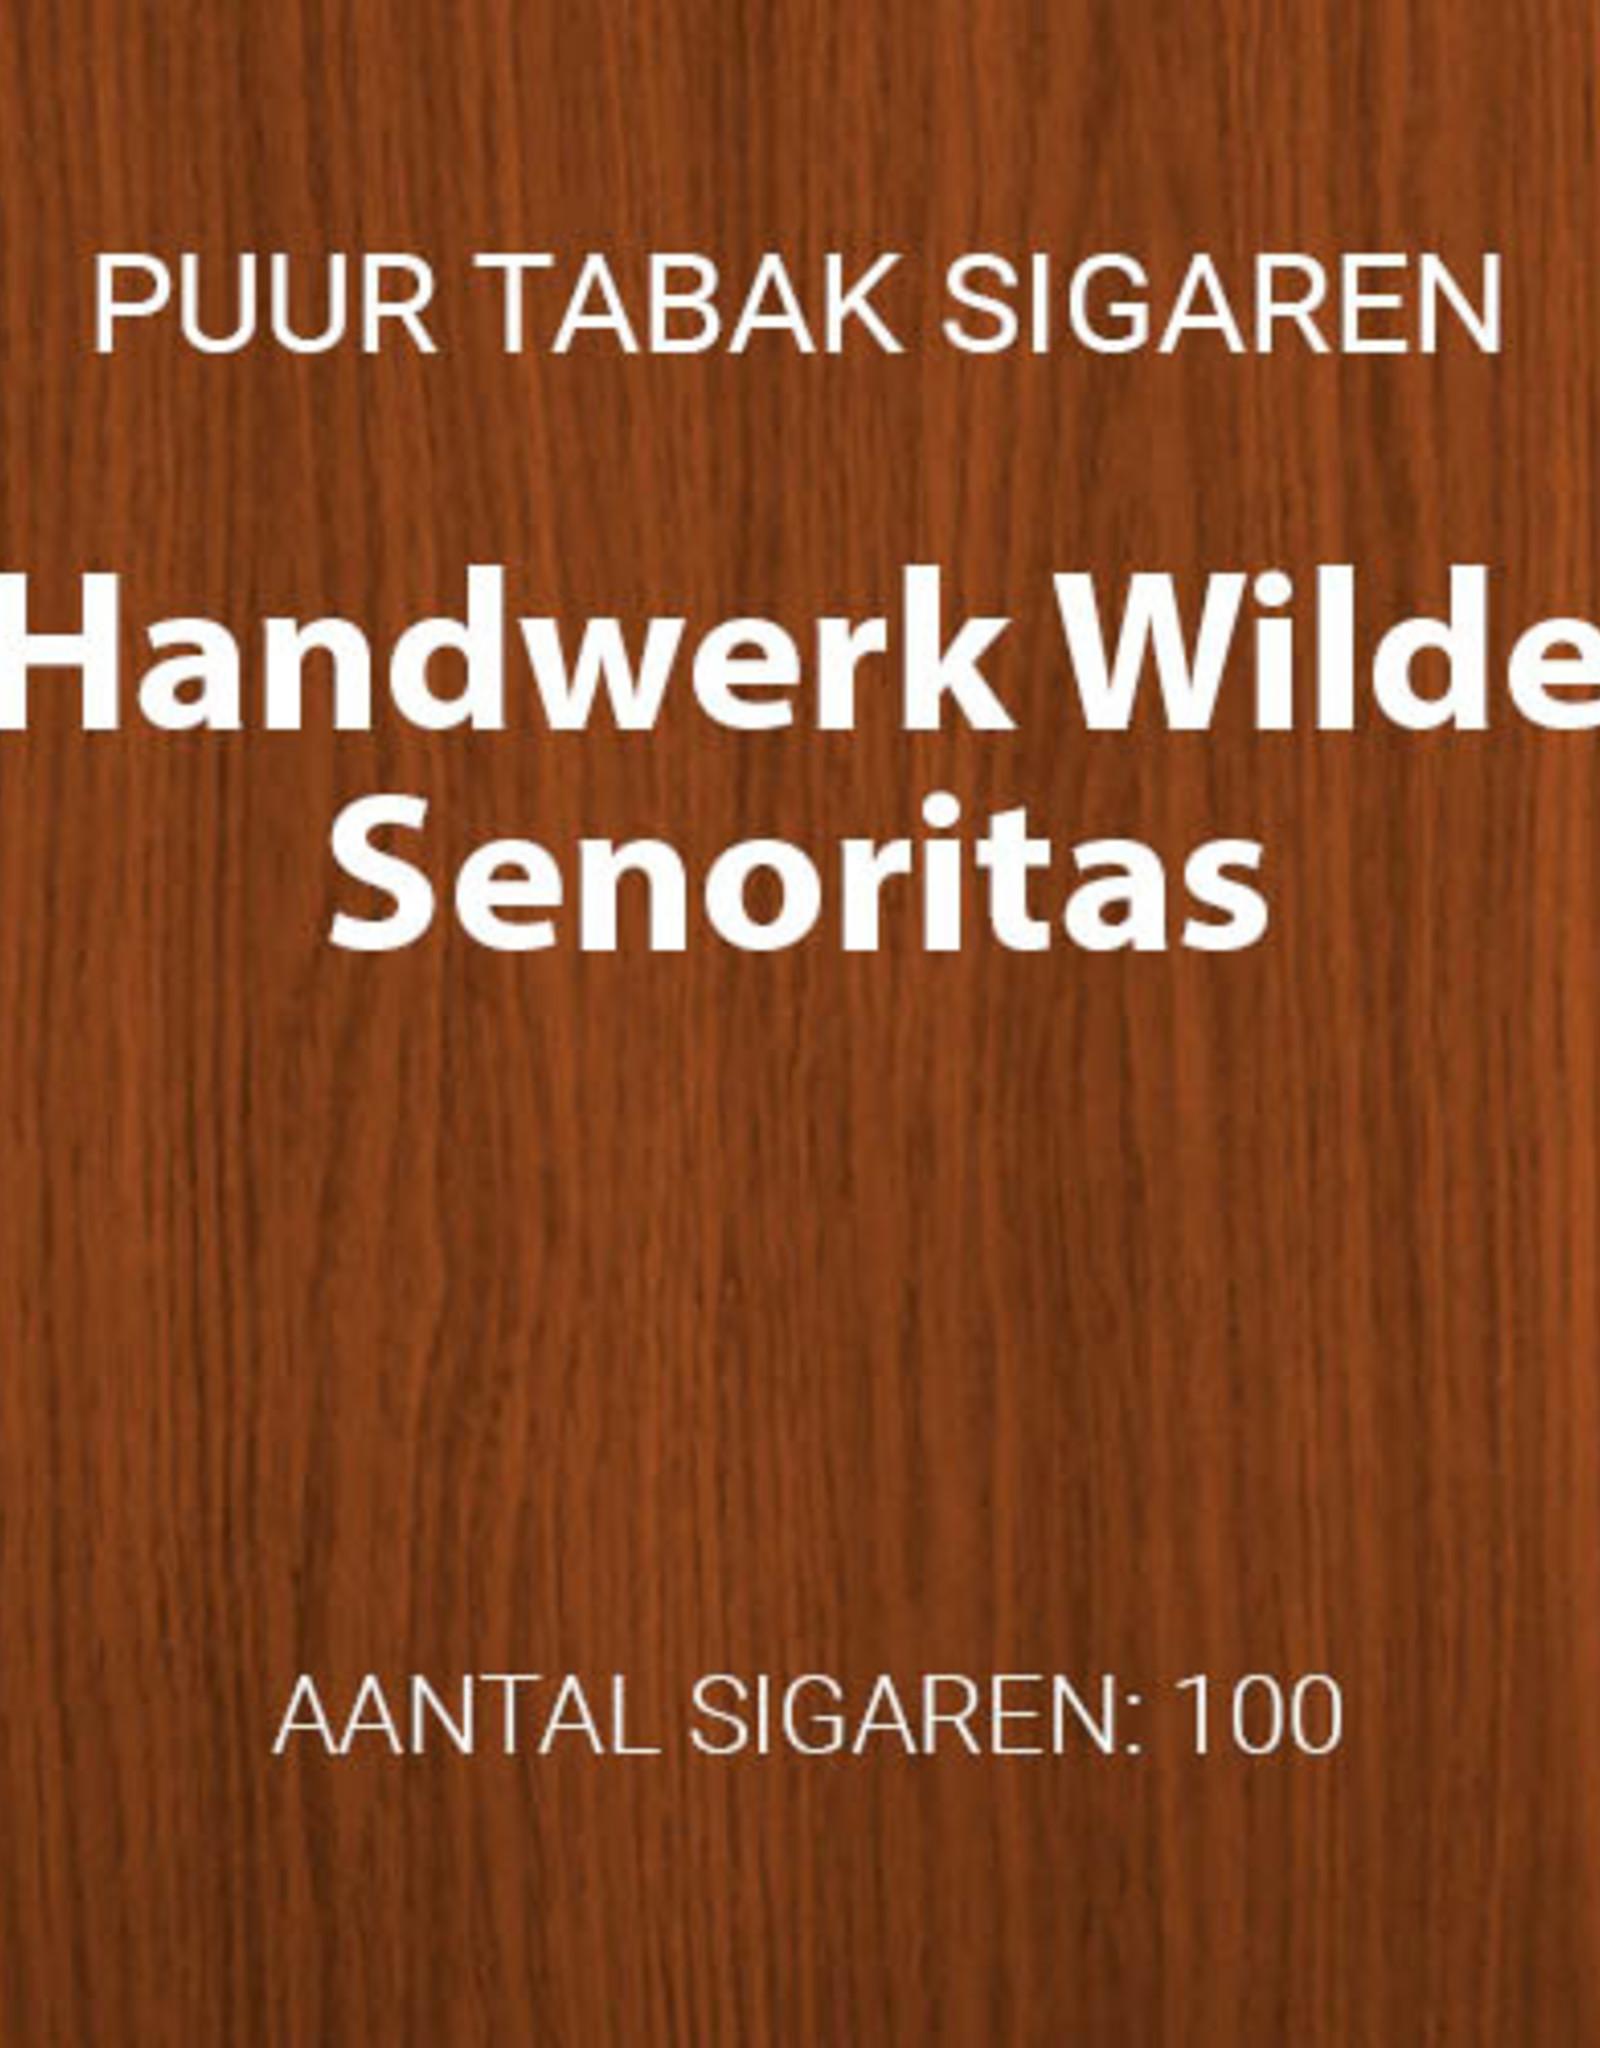 Handwerk Wilde Cigarros 100%